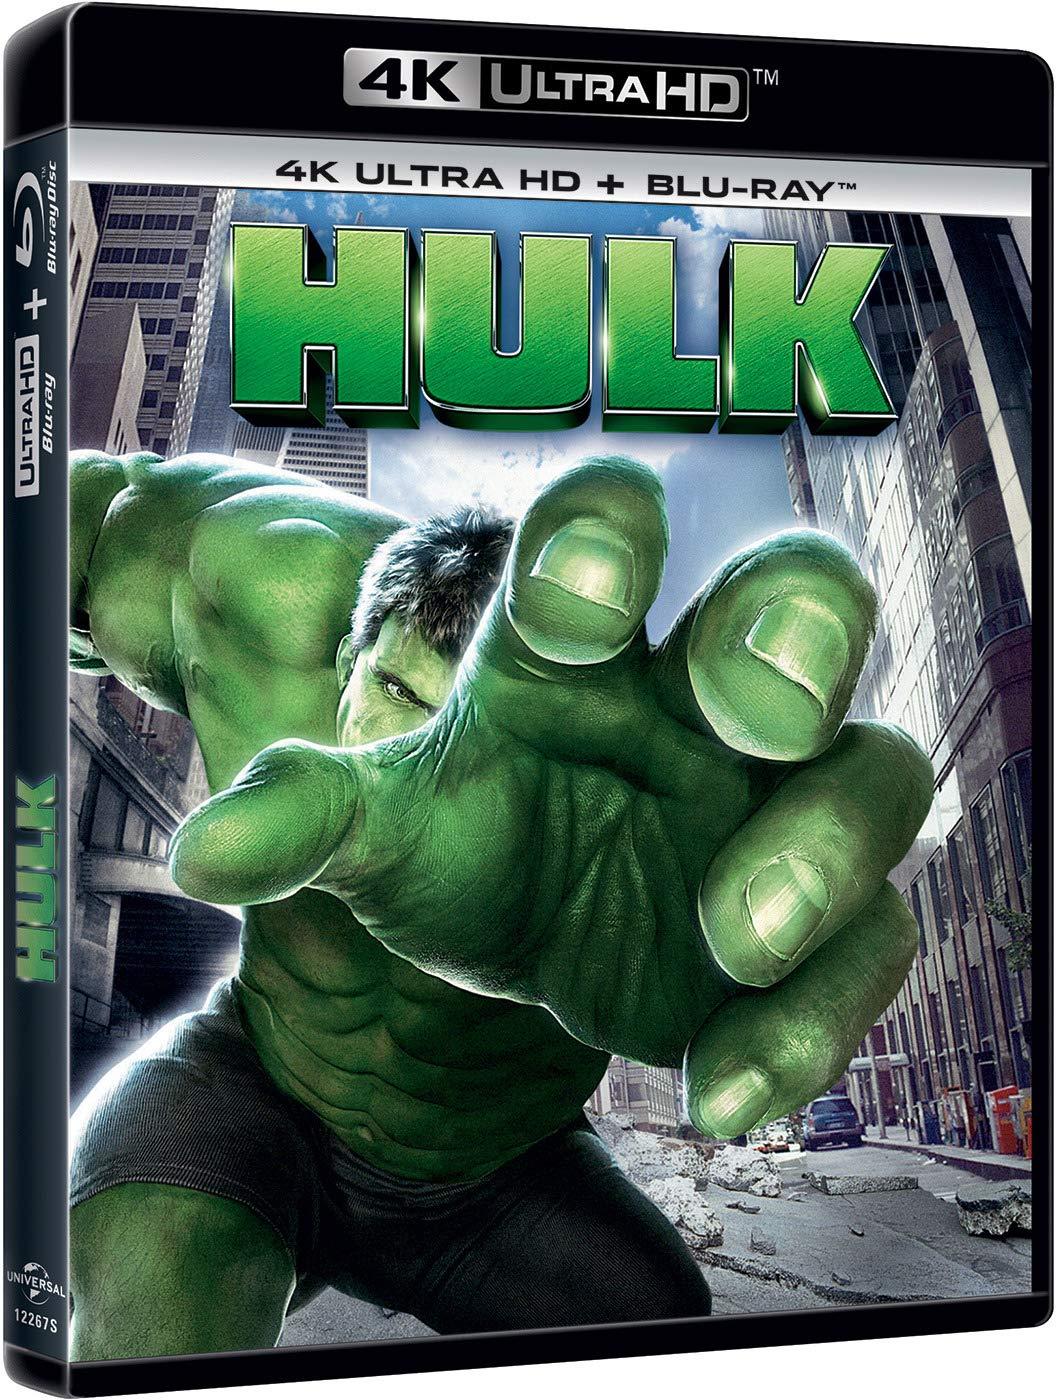 Hulk (4K UHD + BD) [Blu-ray]: Amazon.es: Eric Bana, Jennifer Connelly, Sam Elliott , Ang Lee, Eric Bana, Jennifer Connelly, Universal Pictures, Marvel Enterprises, Valhalla Motion Pictures: Cine y Series TV